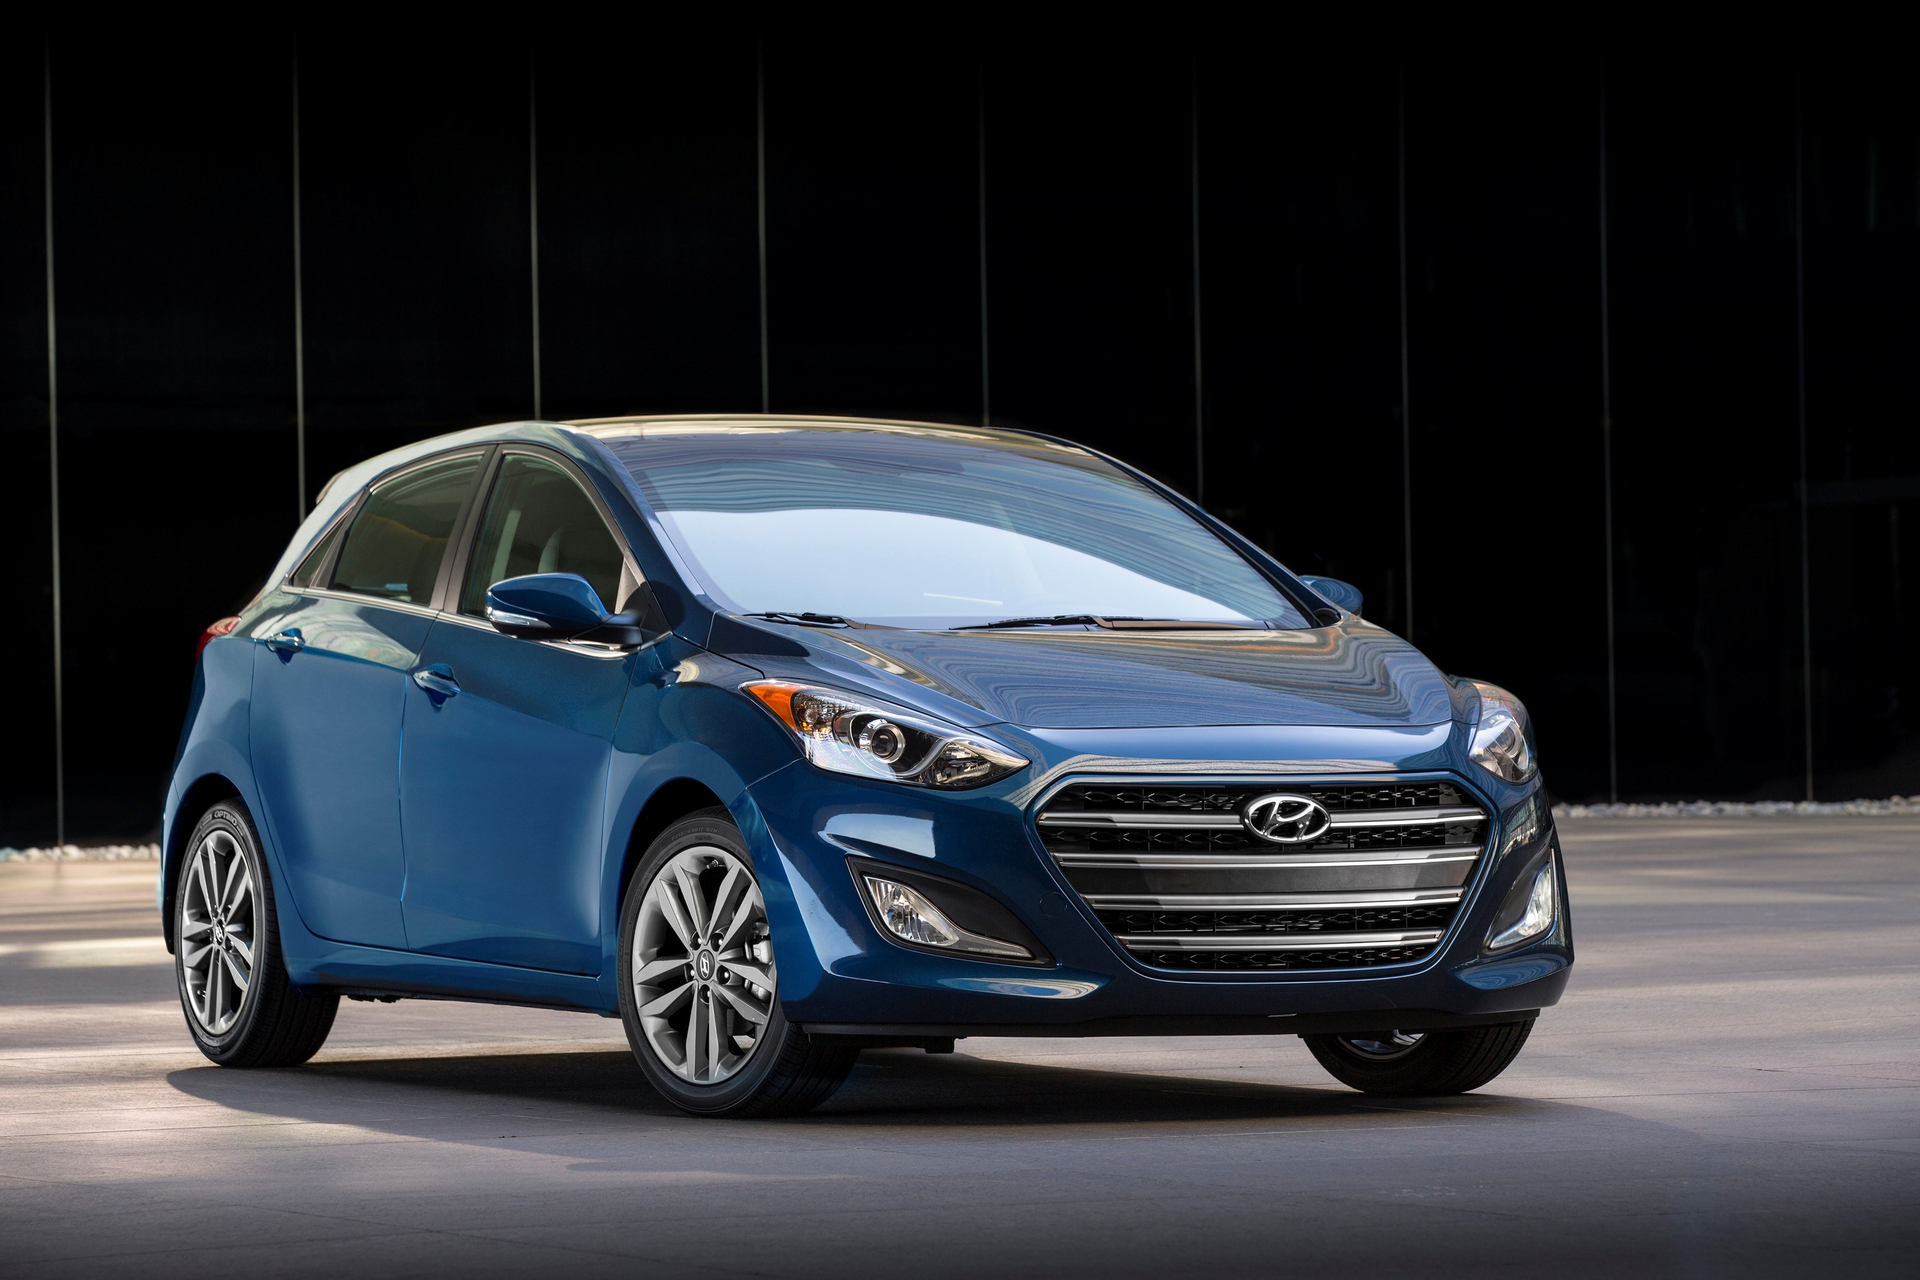 2017 Hyundai Elantra GT © Hyundai Motor Company